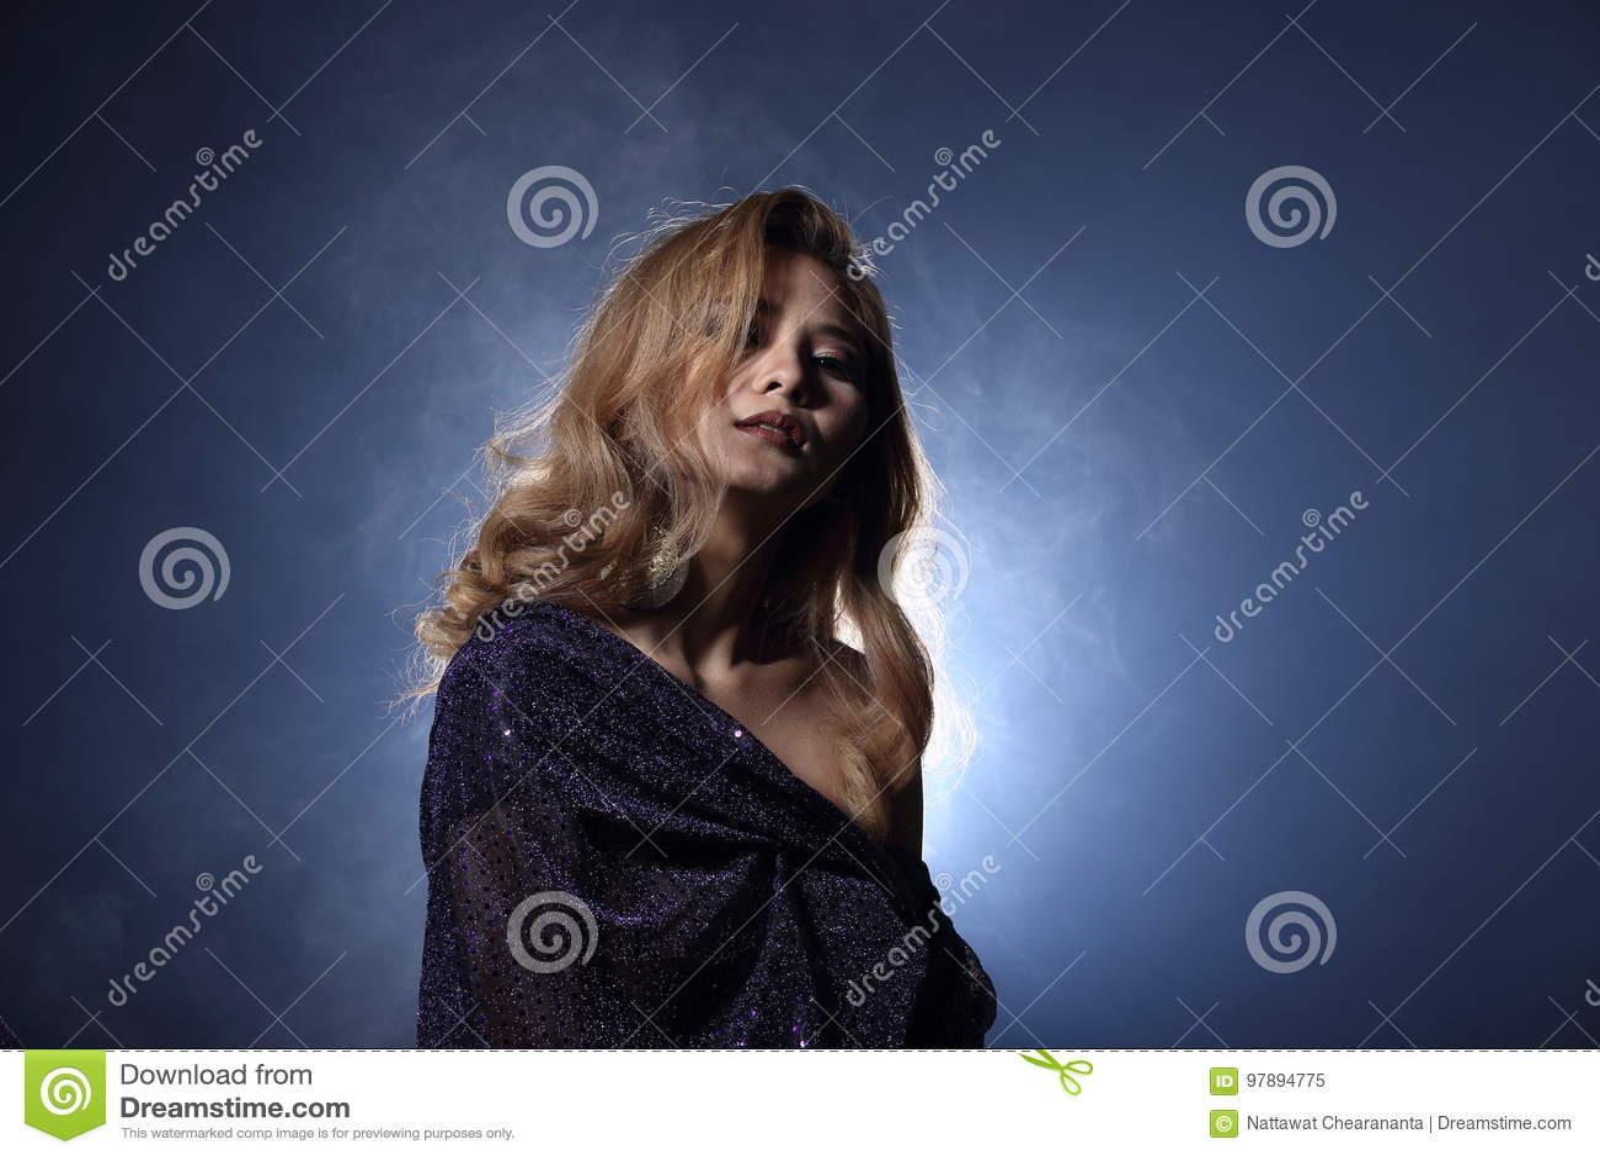 Asian Blonde wave Hair Woman, Portrait open shoulders with purple glitter